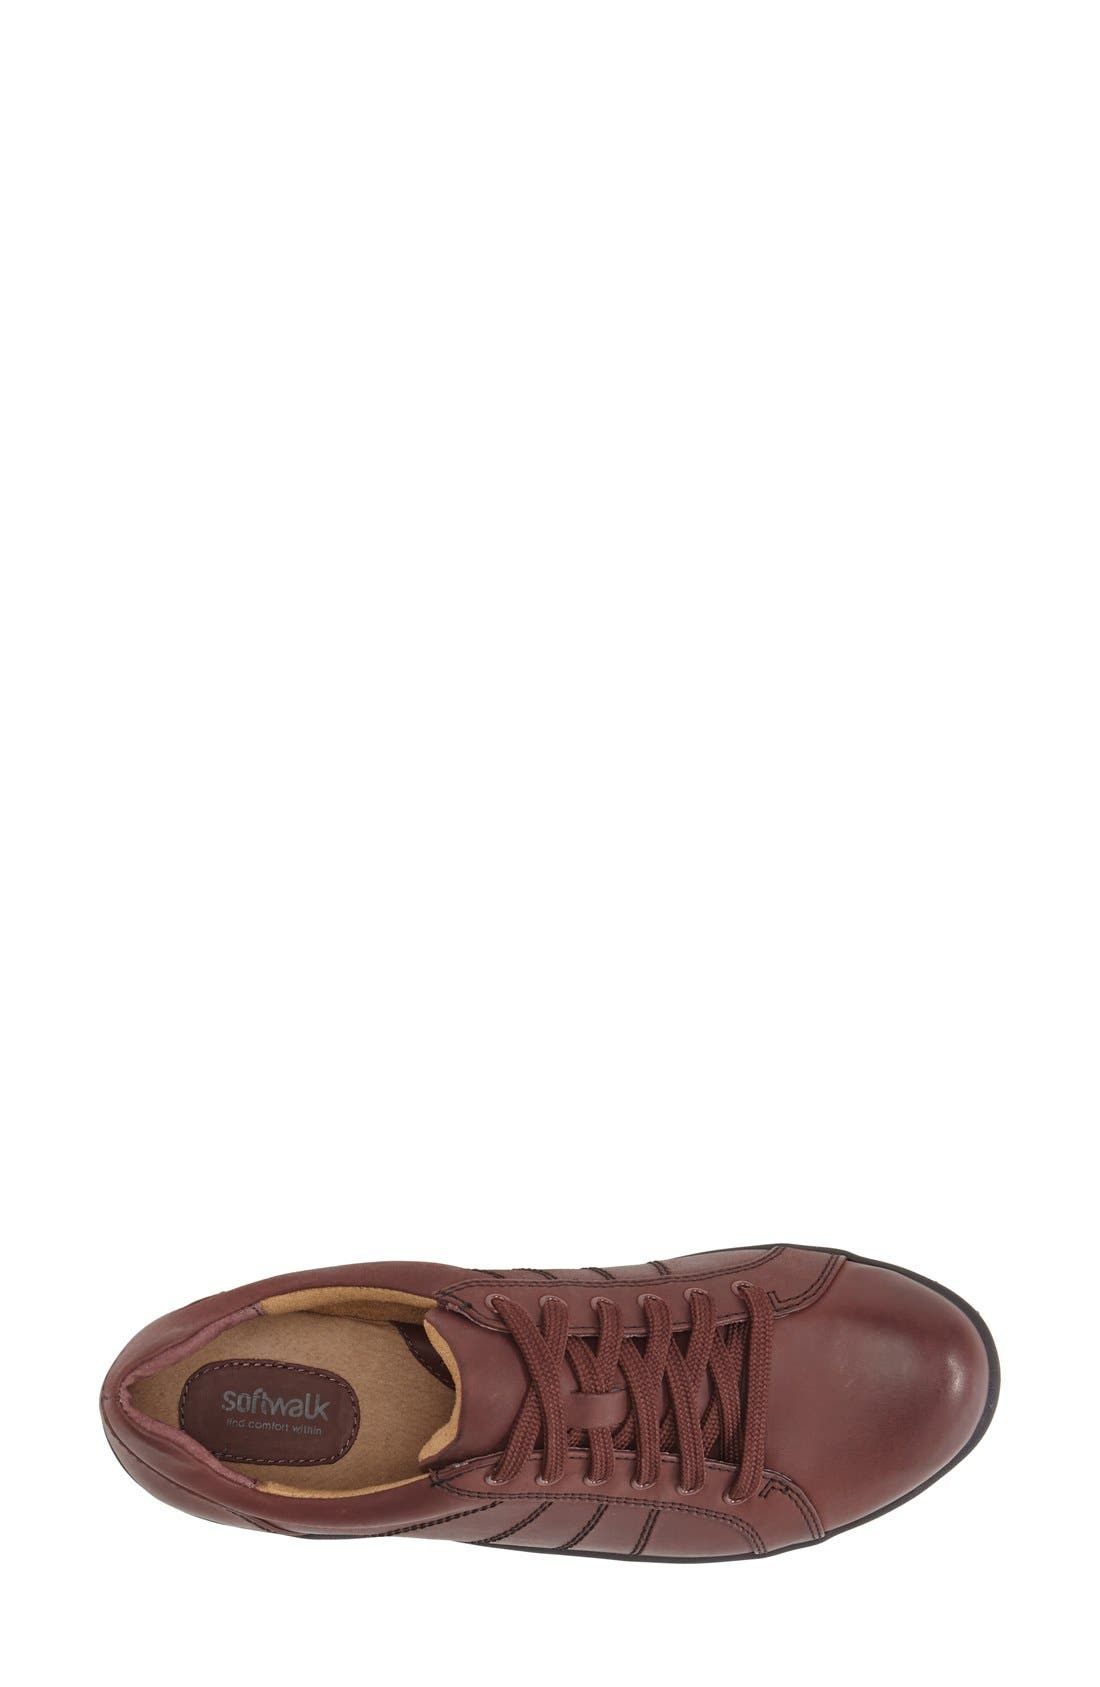 'Hickory' Sneaker,                             Alternate thumbnail 12, color,